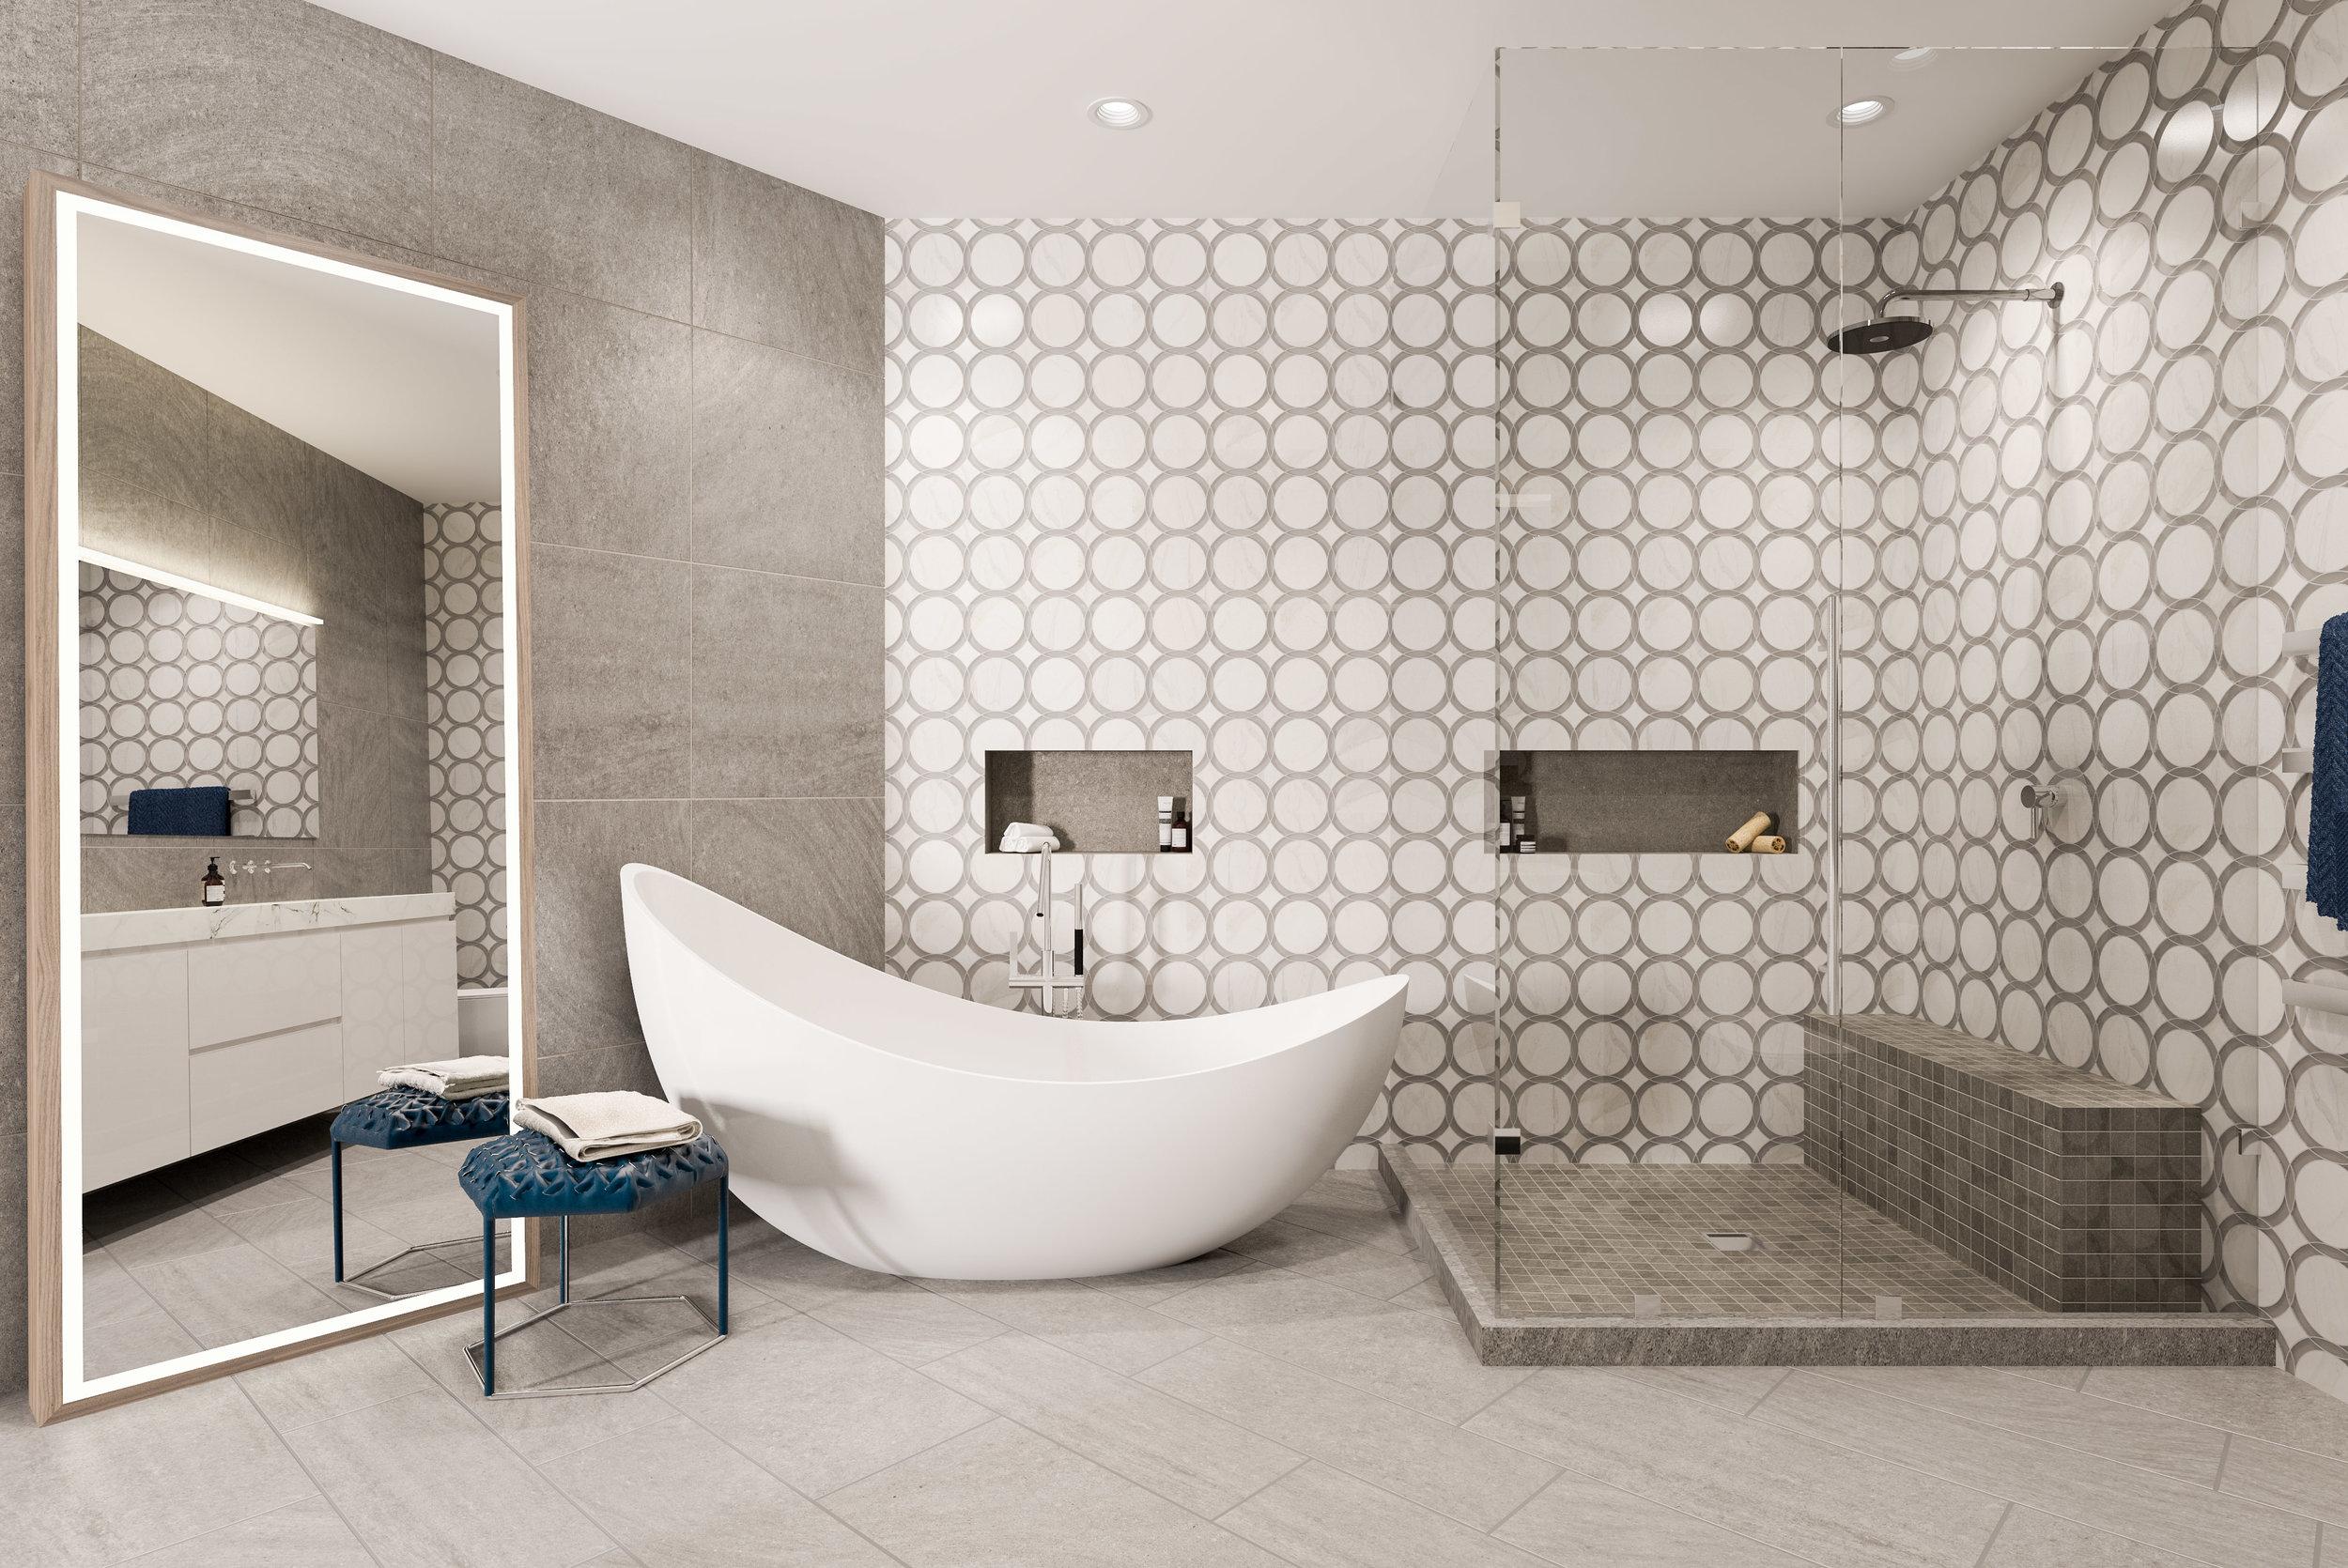 RumPoint_Bathroom3_Final01.jpg